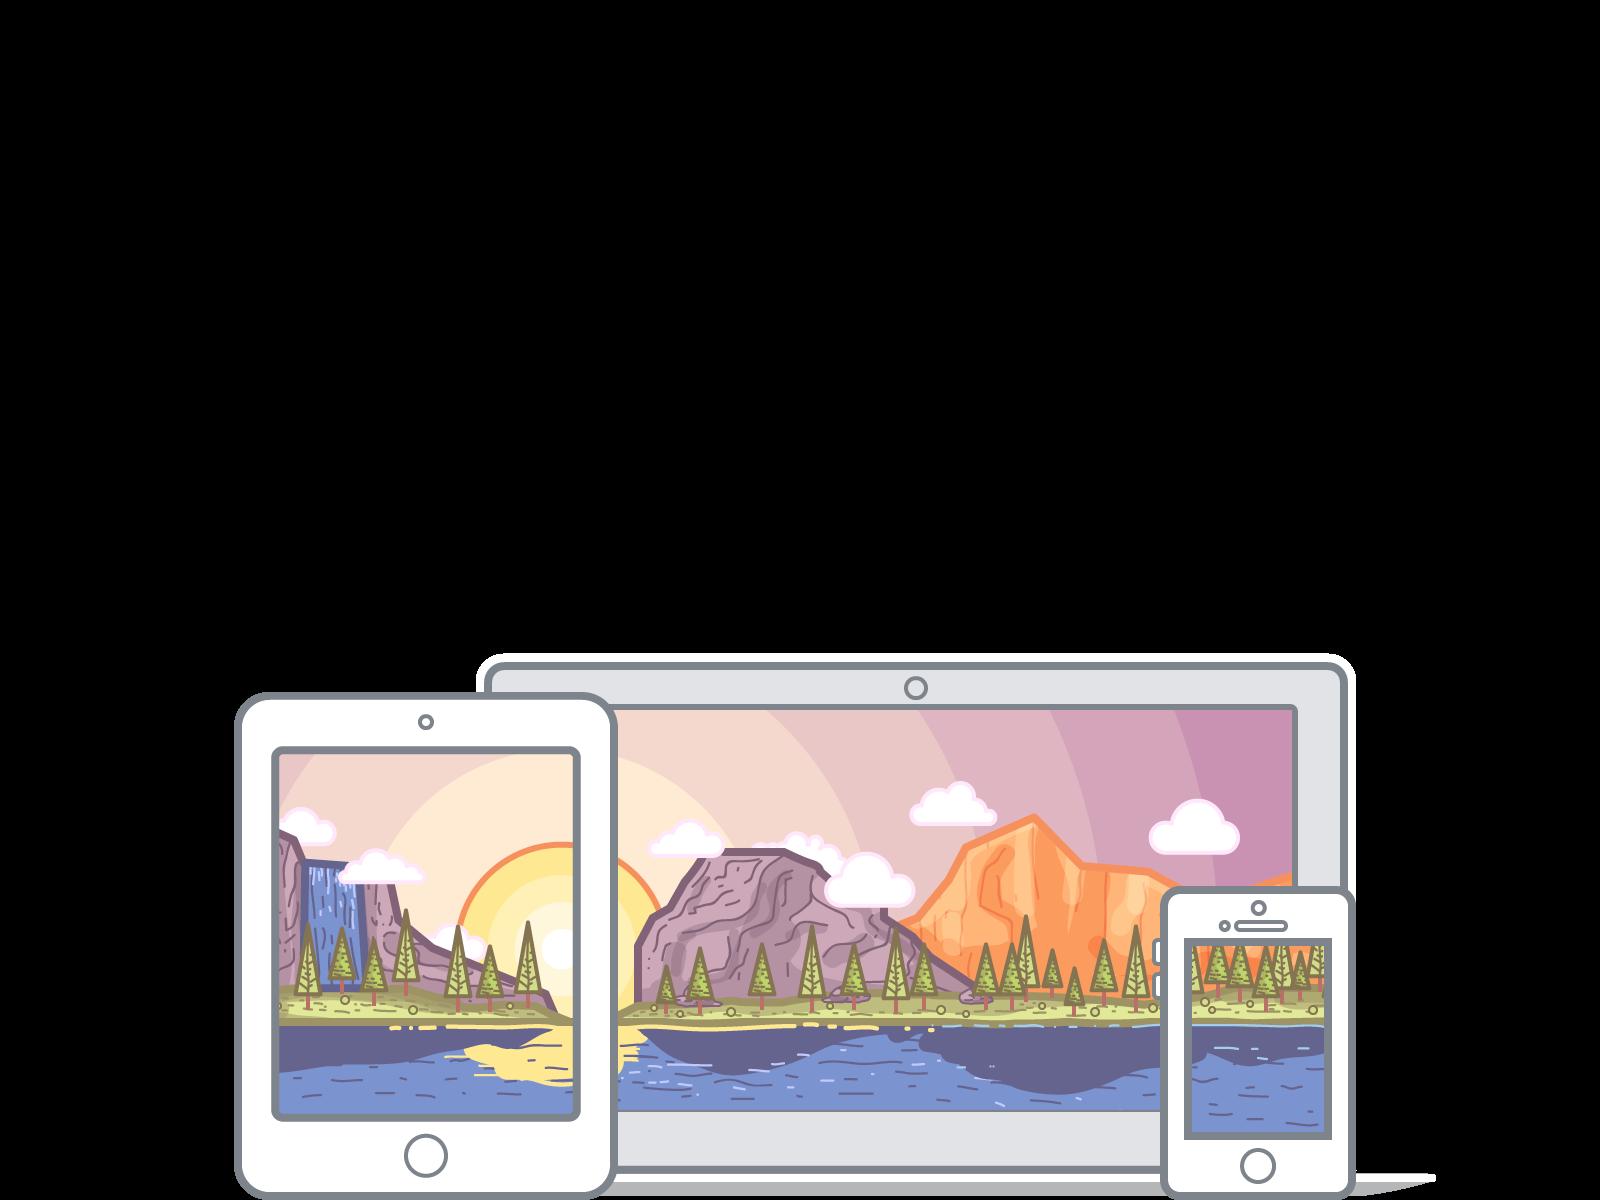 2014年10月推出的OS X 10.10 YOSEMITE